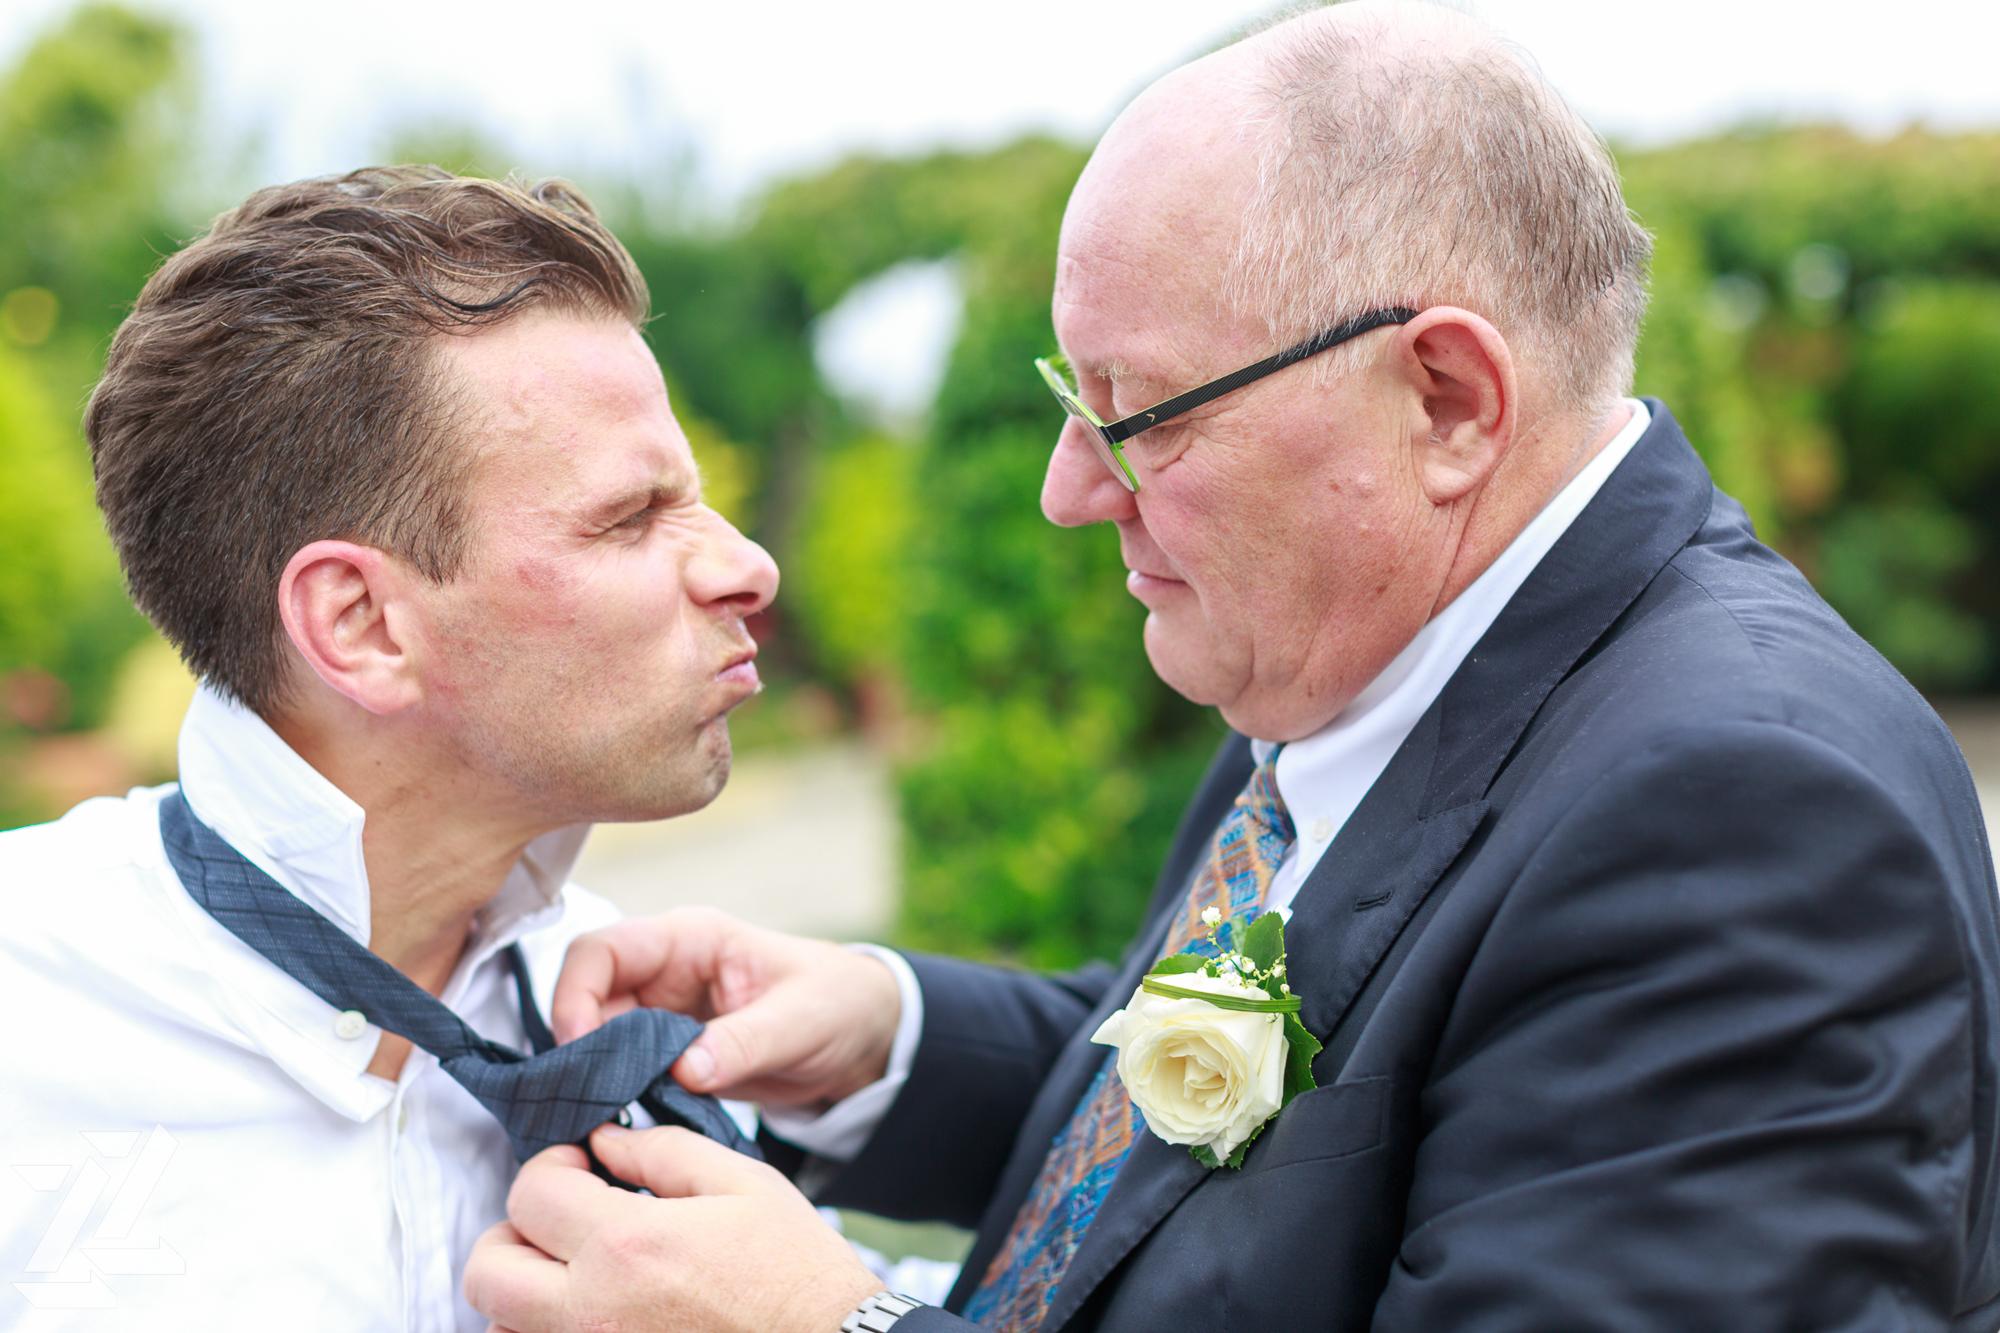 scranton-wedding-photography-zak-zavada-2014.09-isaacJudie-0912.jpg